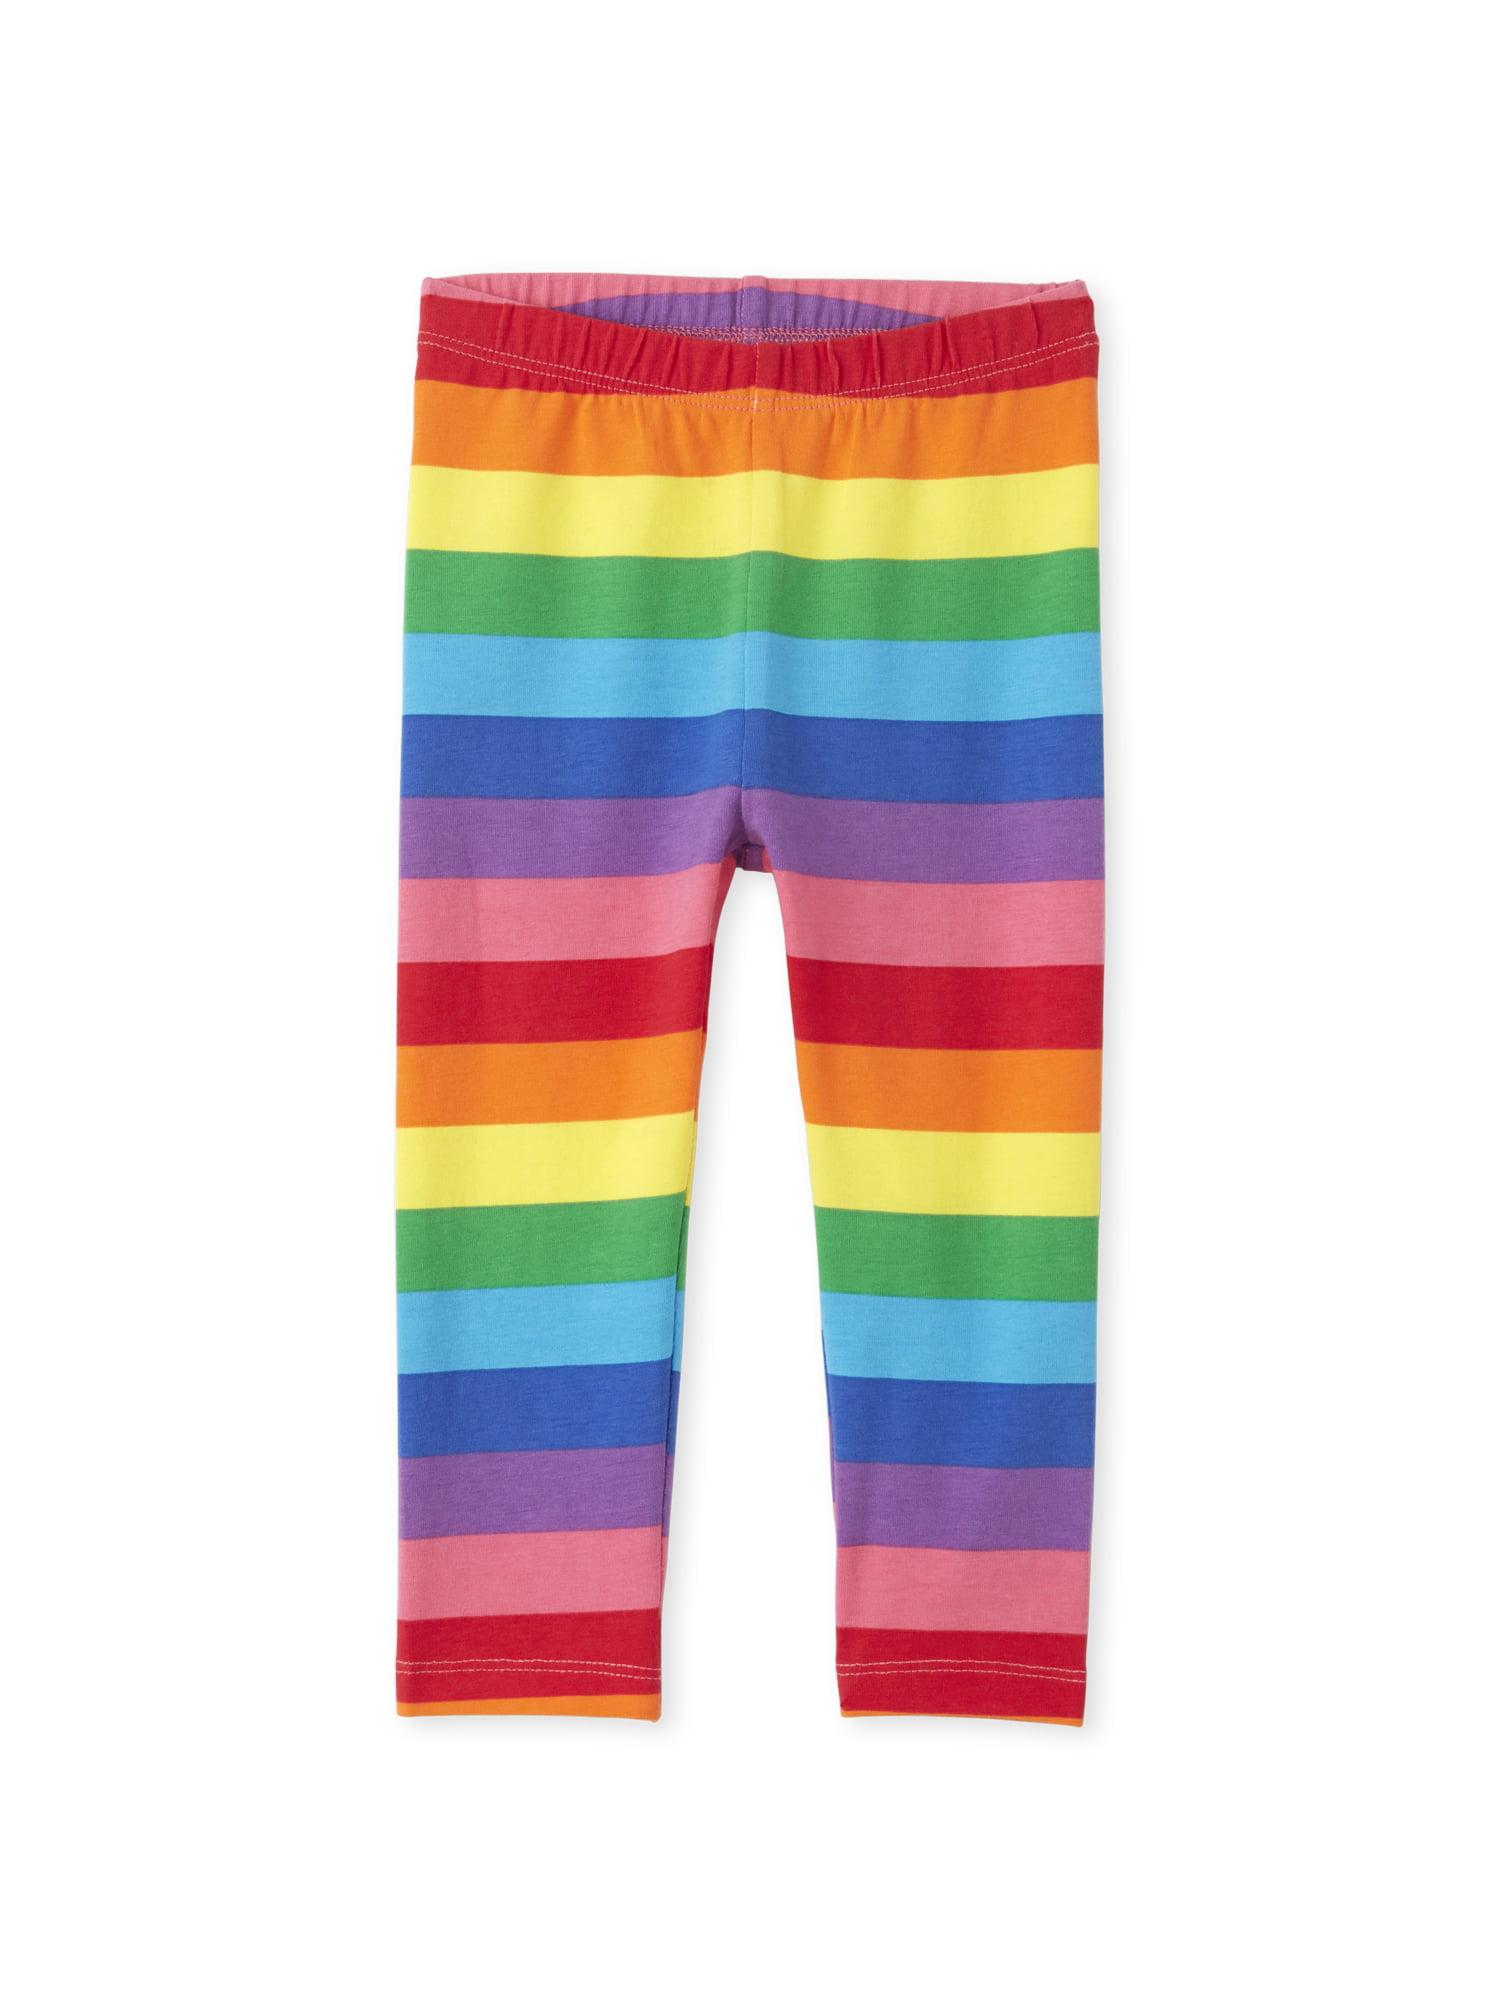 toddler pants rainbow pants multicolour leggings baby leggings girls clothing Galaxy print leggings